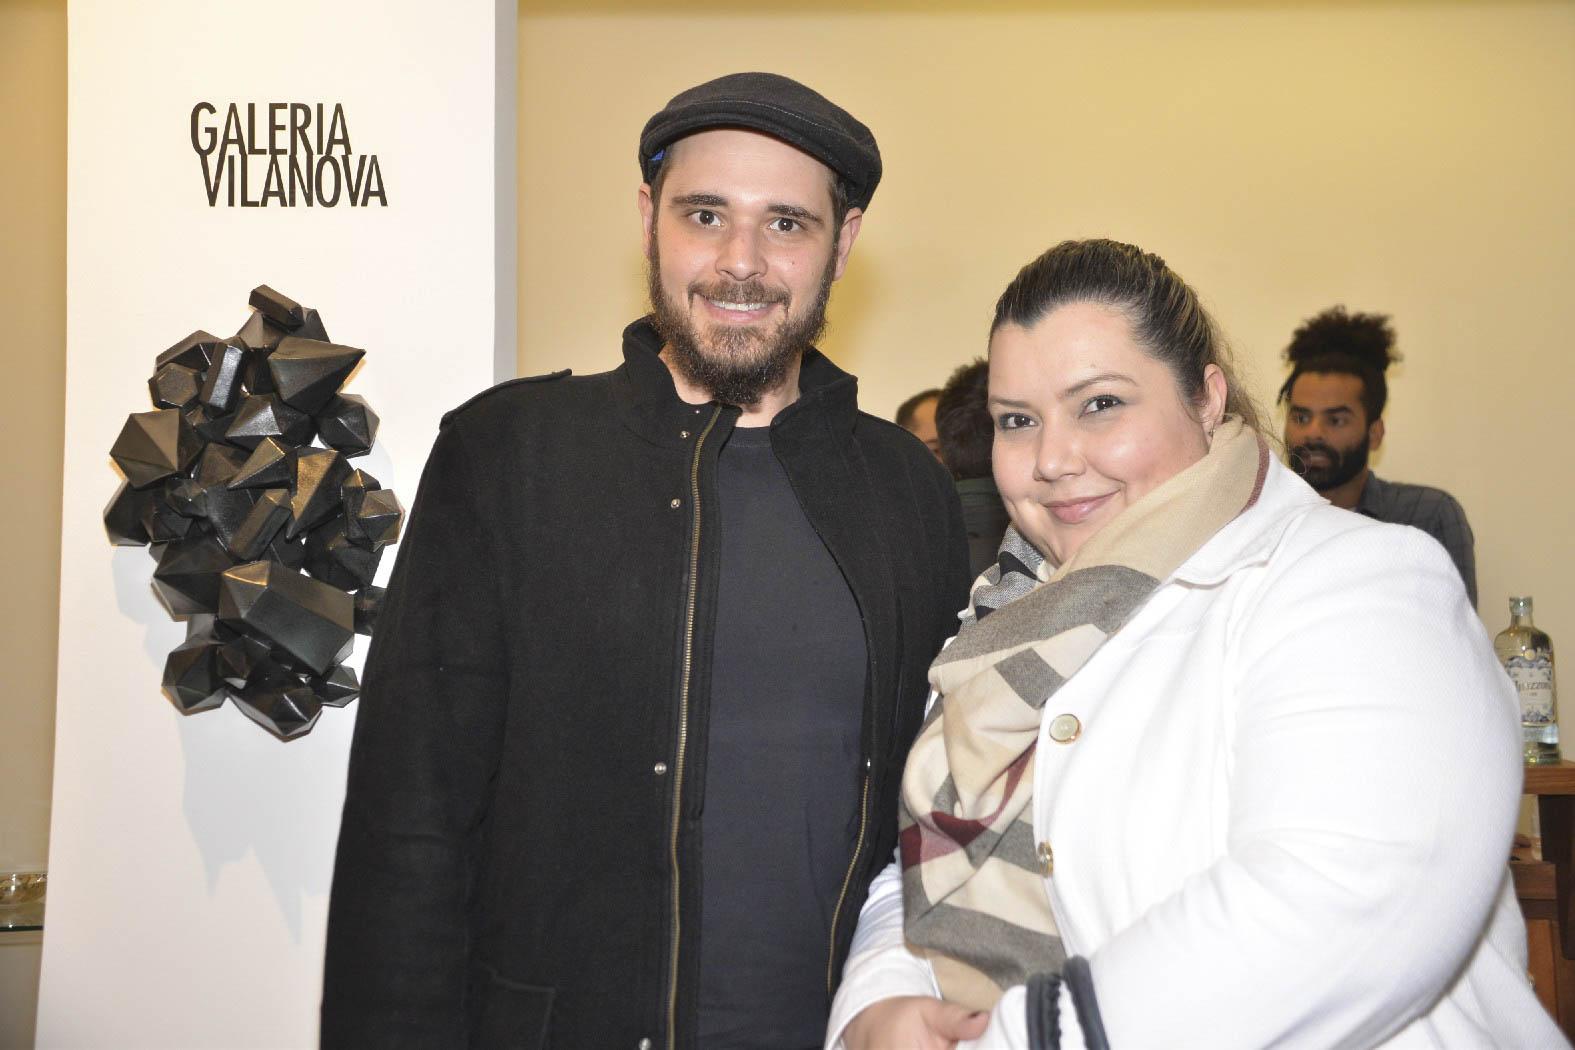 Eduardo Fadul e Fernanda Gomes (3)